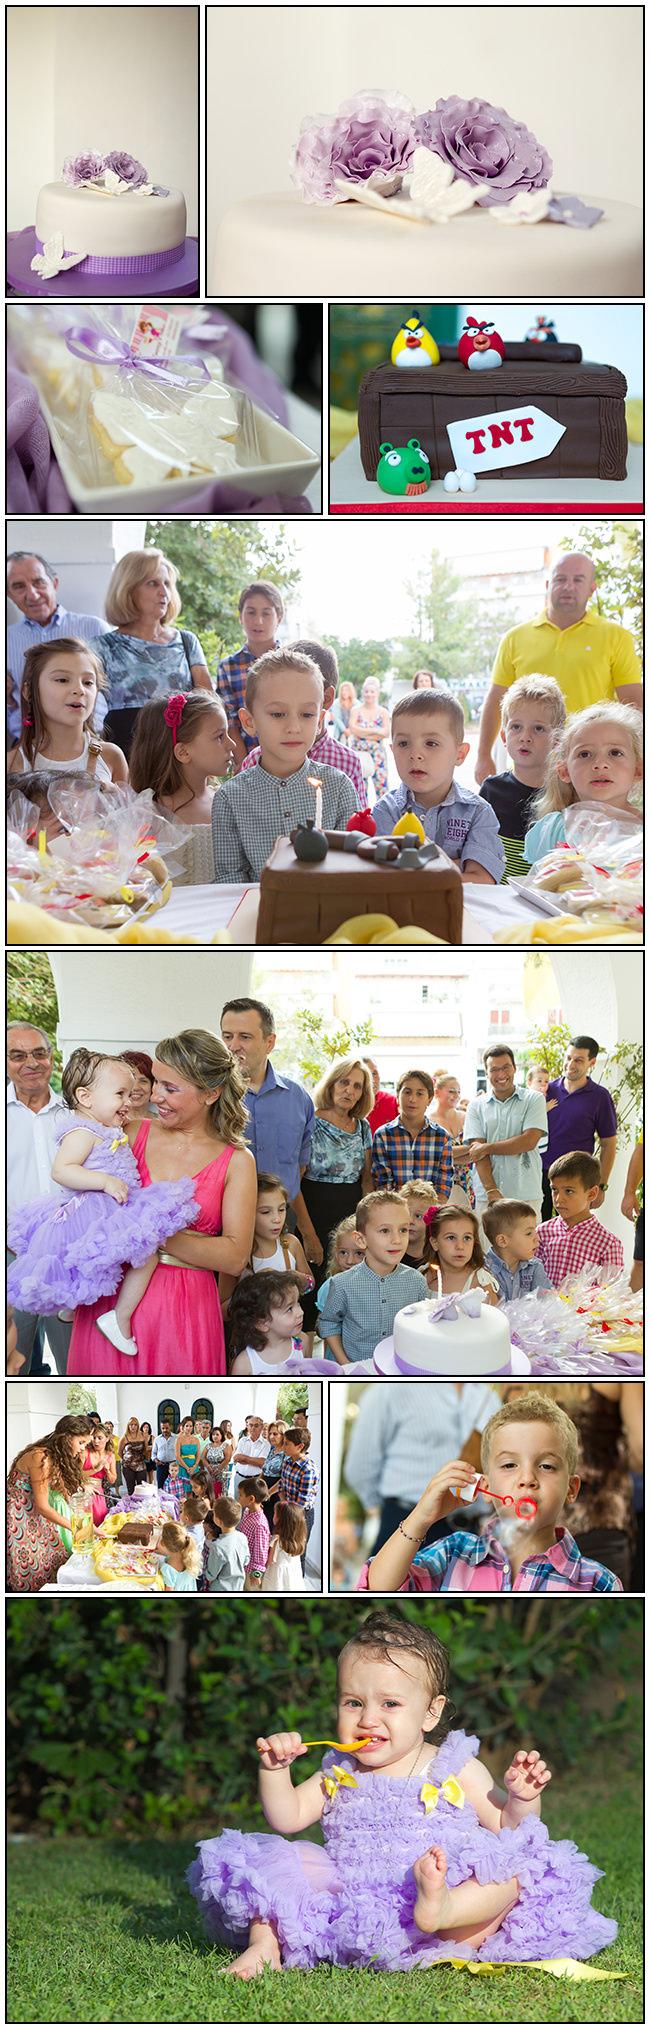 Mirto baptism decorations